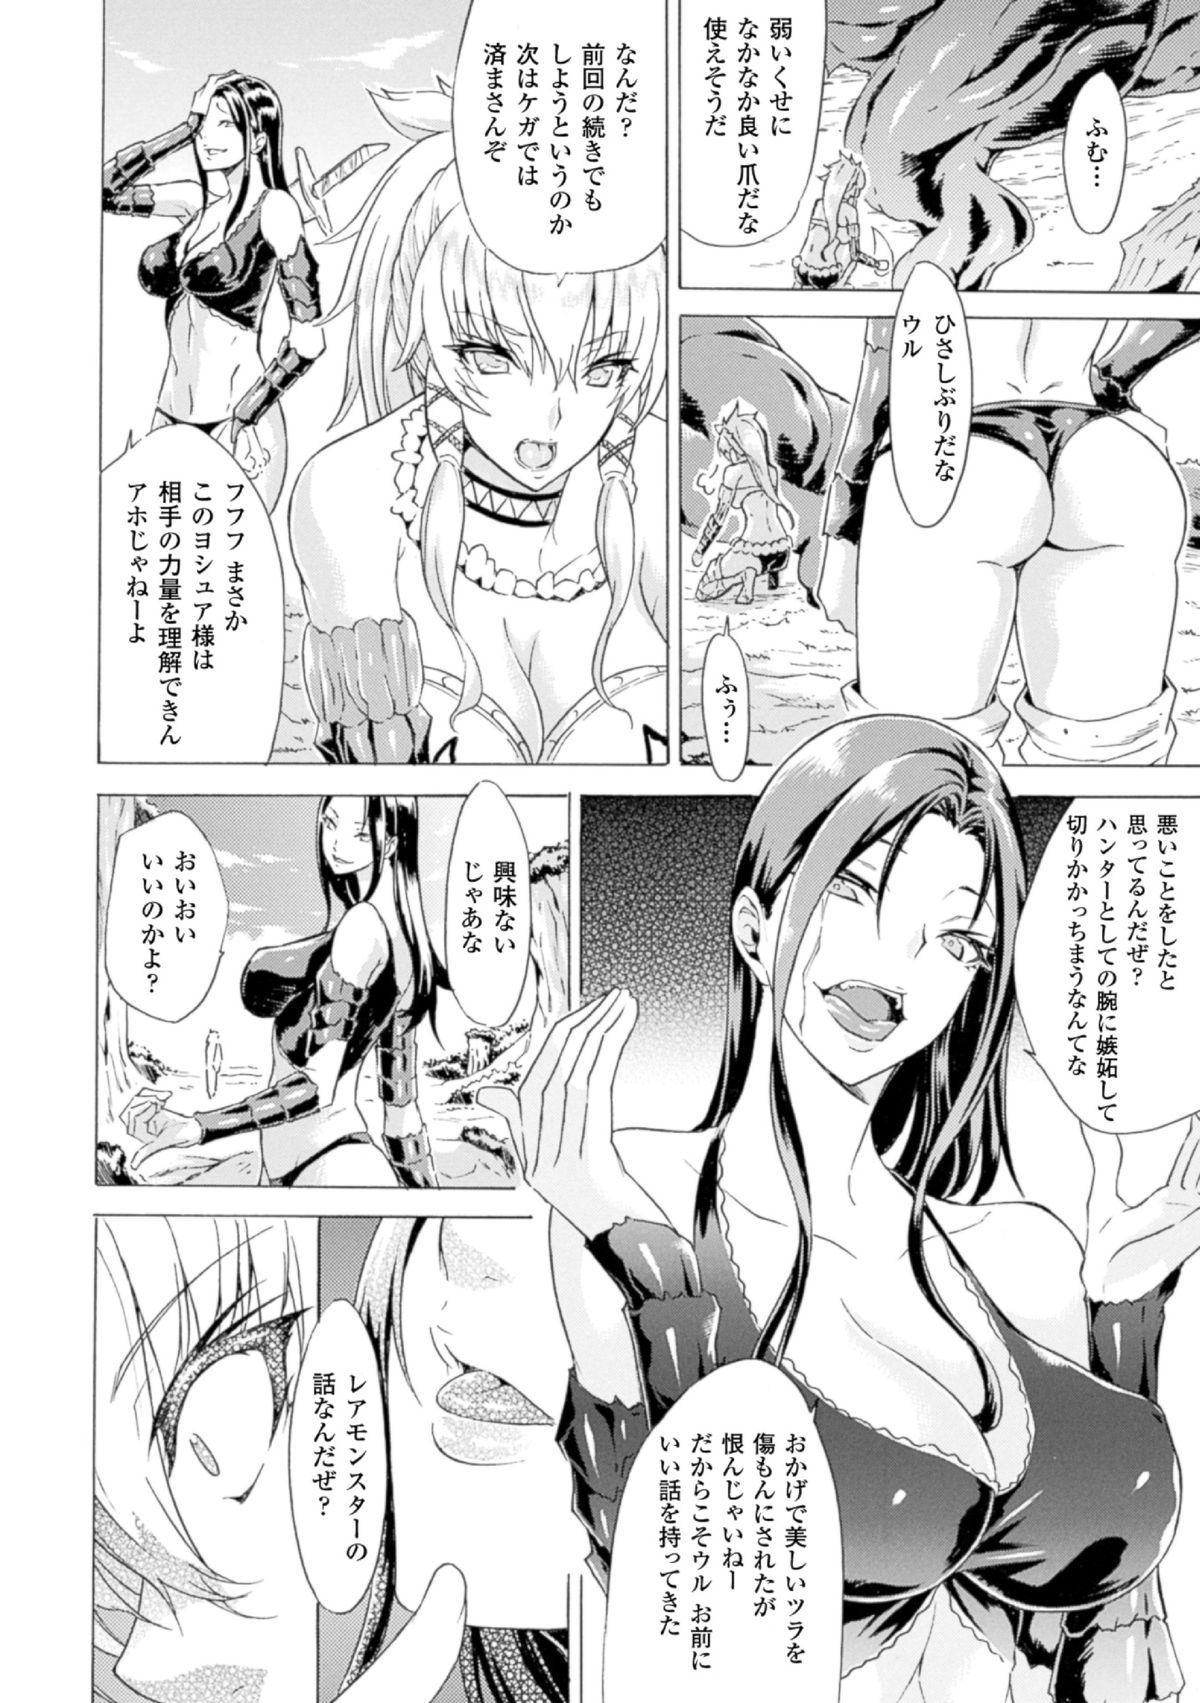 2D Comic Magazine Hunter Heroine AntholoG Vol.1 23